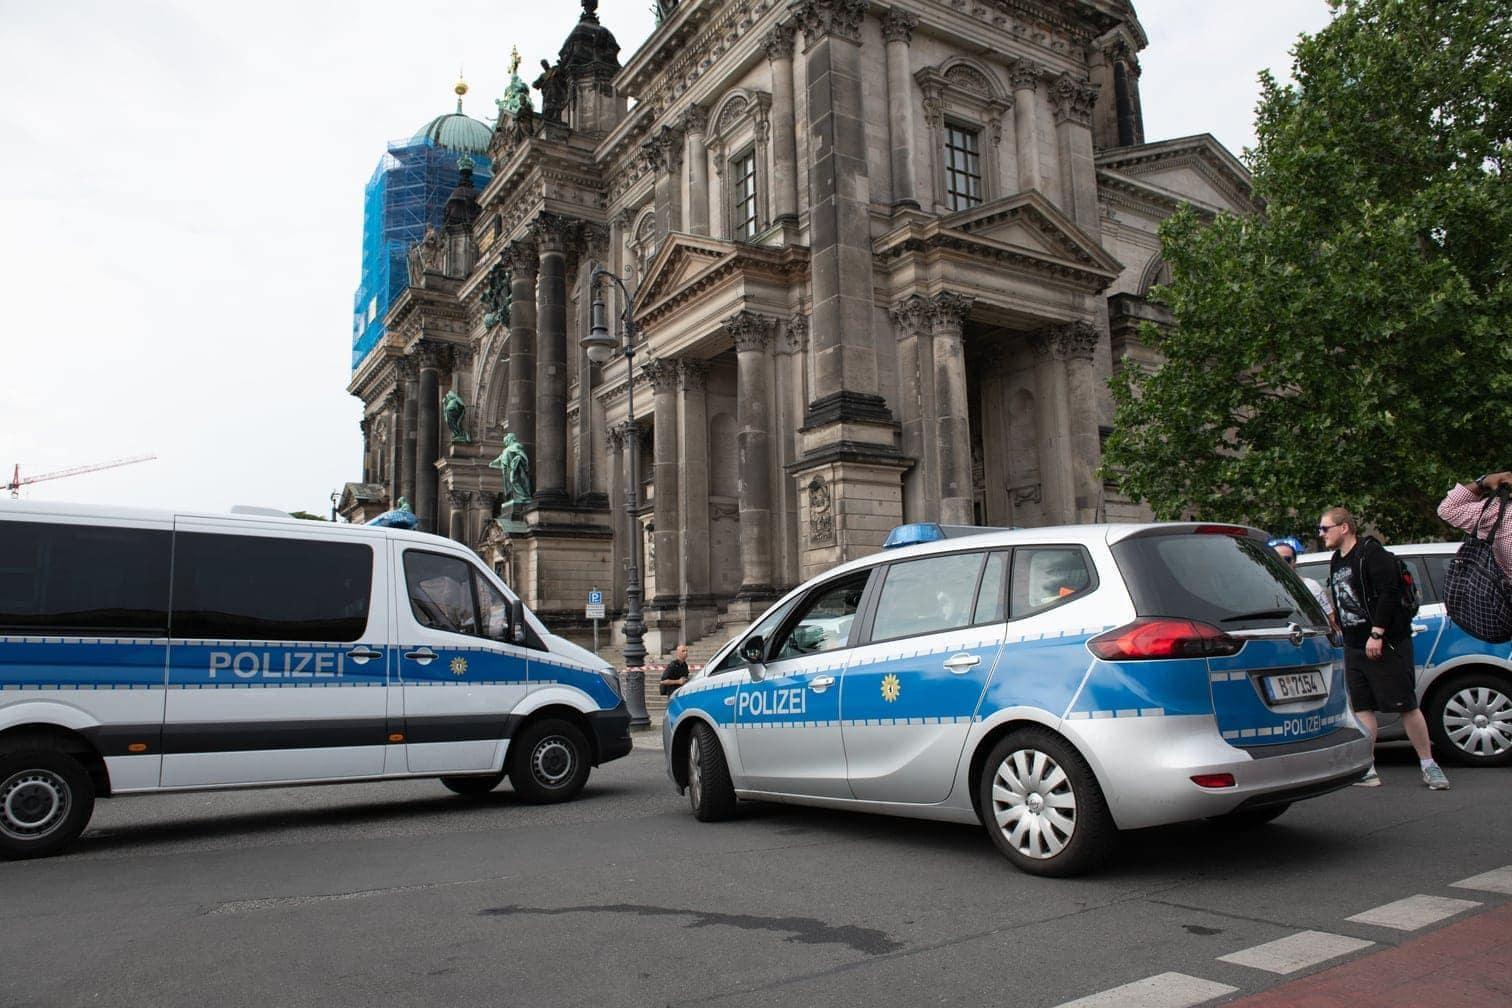 <p>Polizeifahrzeuge stehen vor dem Dom.</p> Foto: dpa